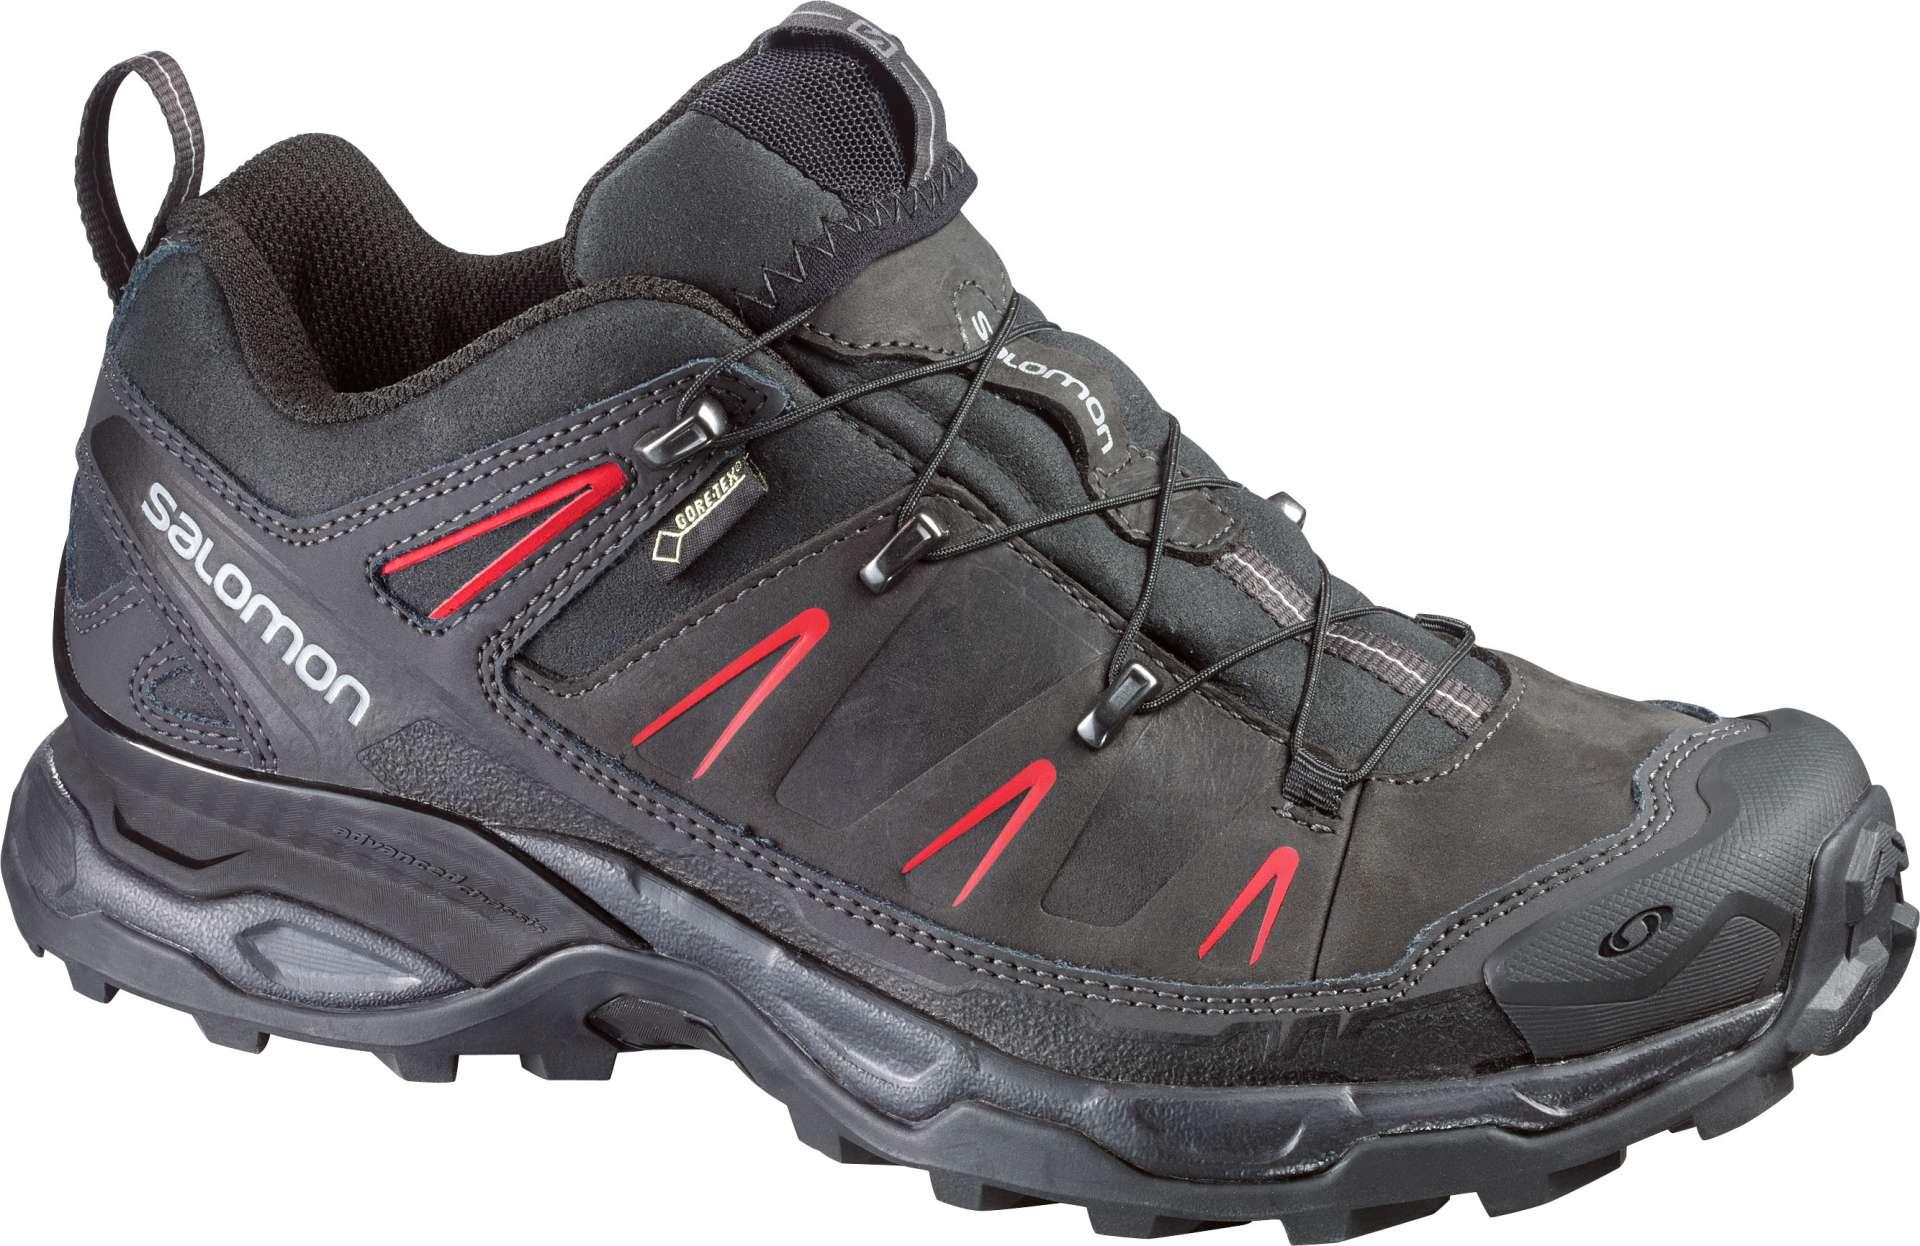 Lichte Wandelschoenen Dames : Salomon x ultra ltr gtx wandelschoenen zwart grijs roze dames koop